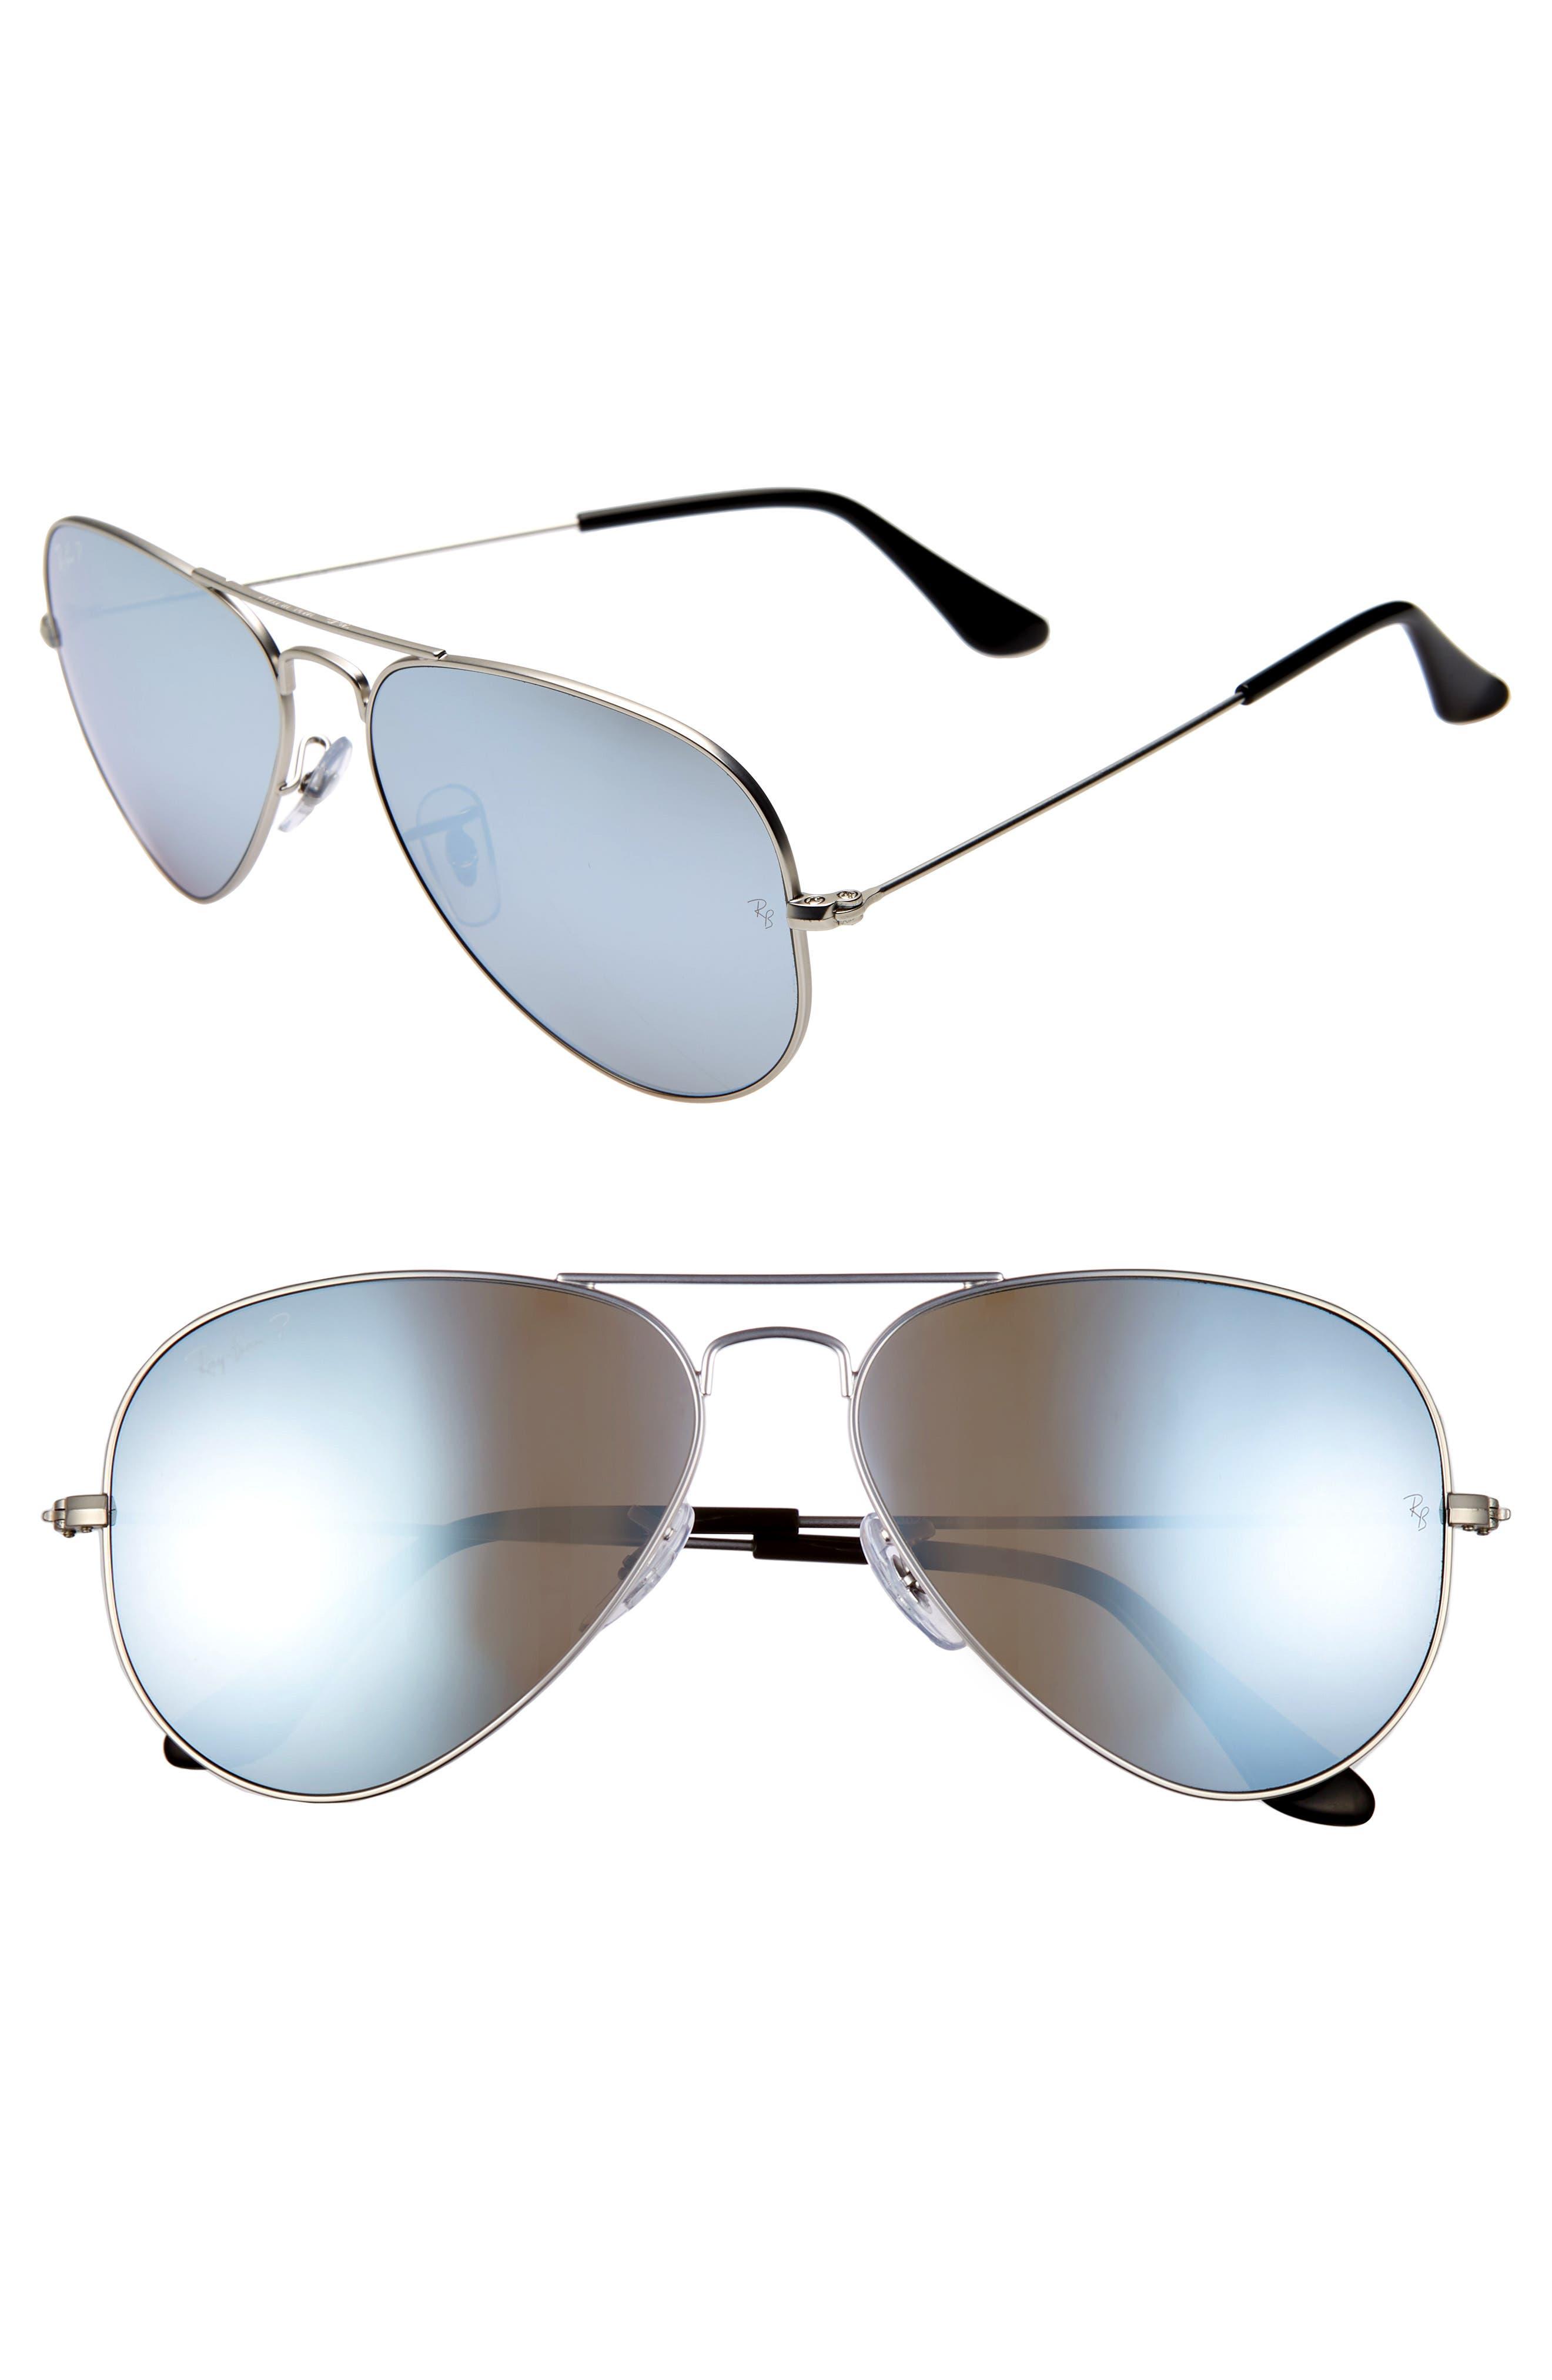 Standard Icons 58mm Mirrored Polarized Aviator Sunglasses,                             Main thumbnail 1, color,                             040